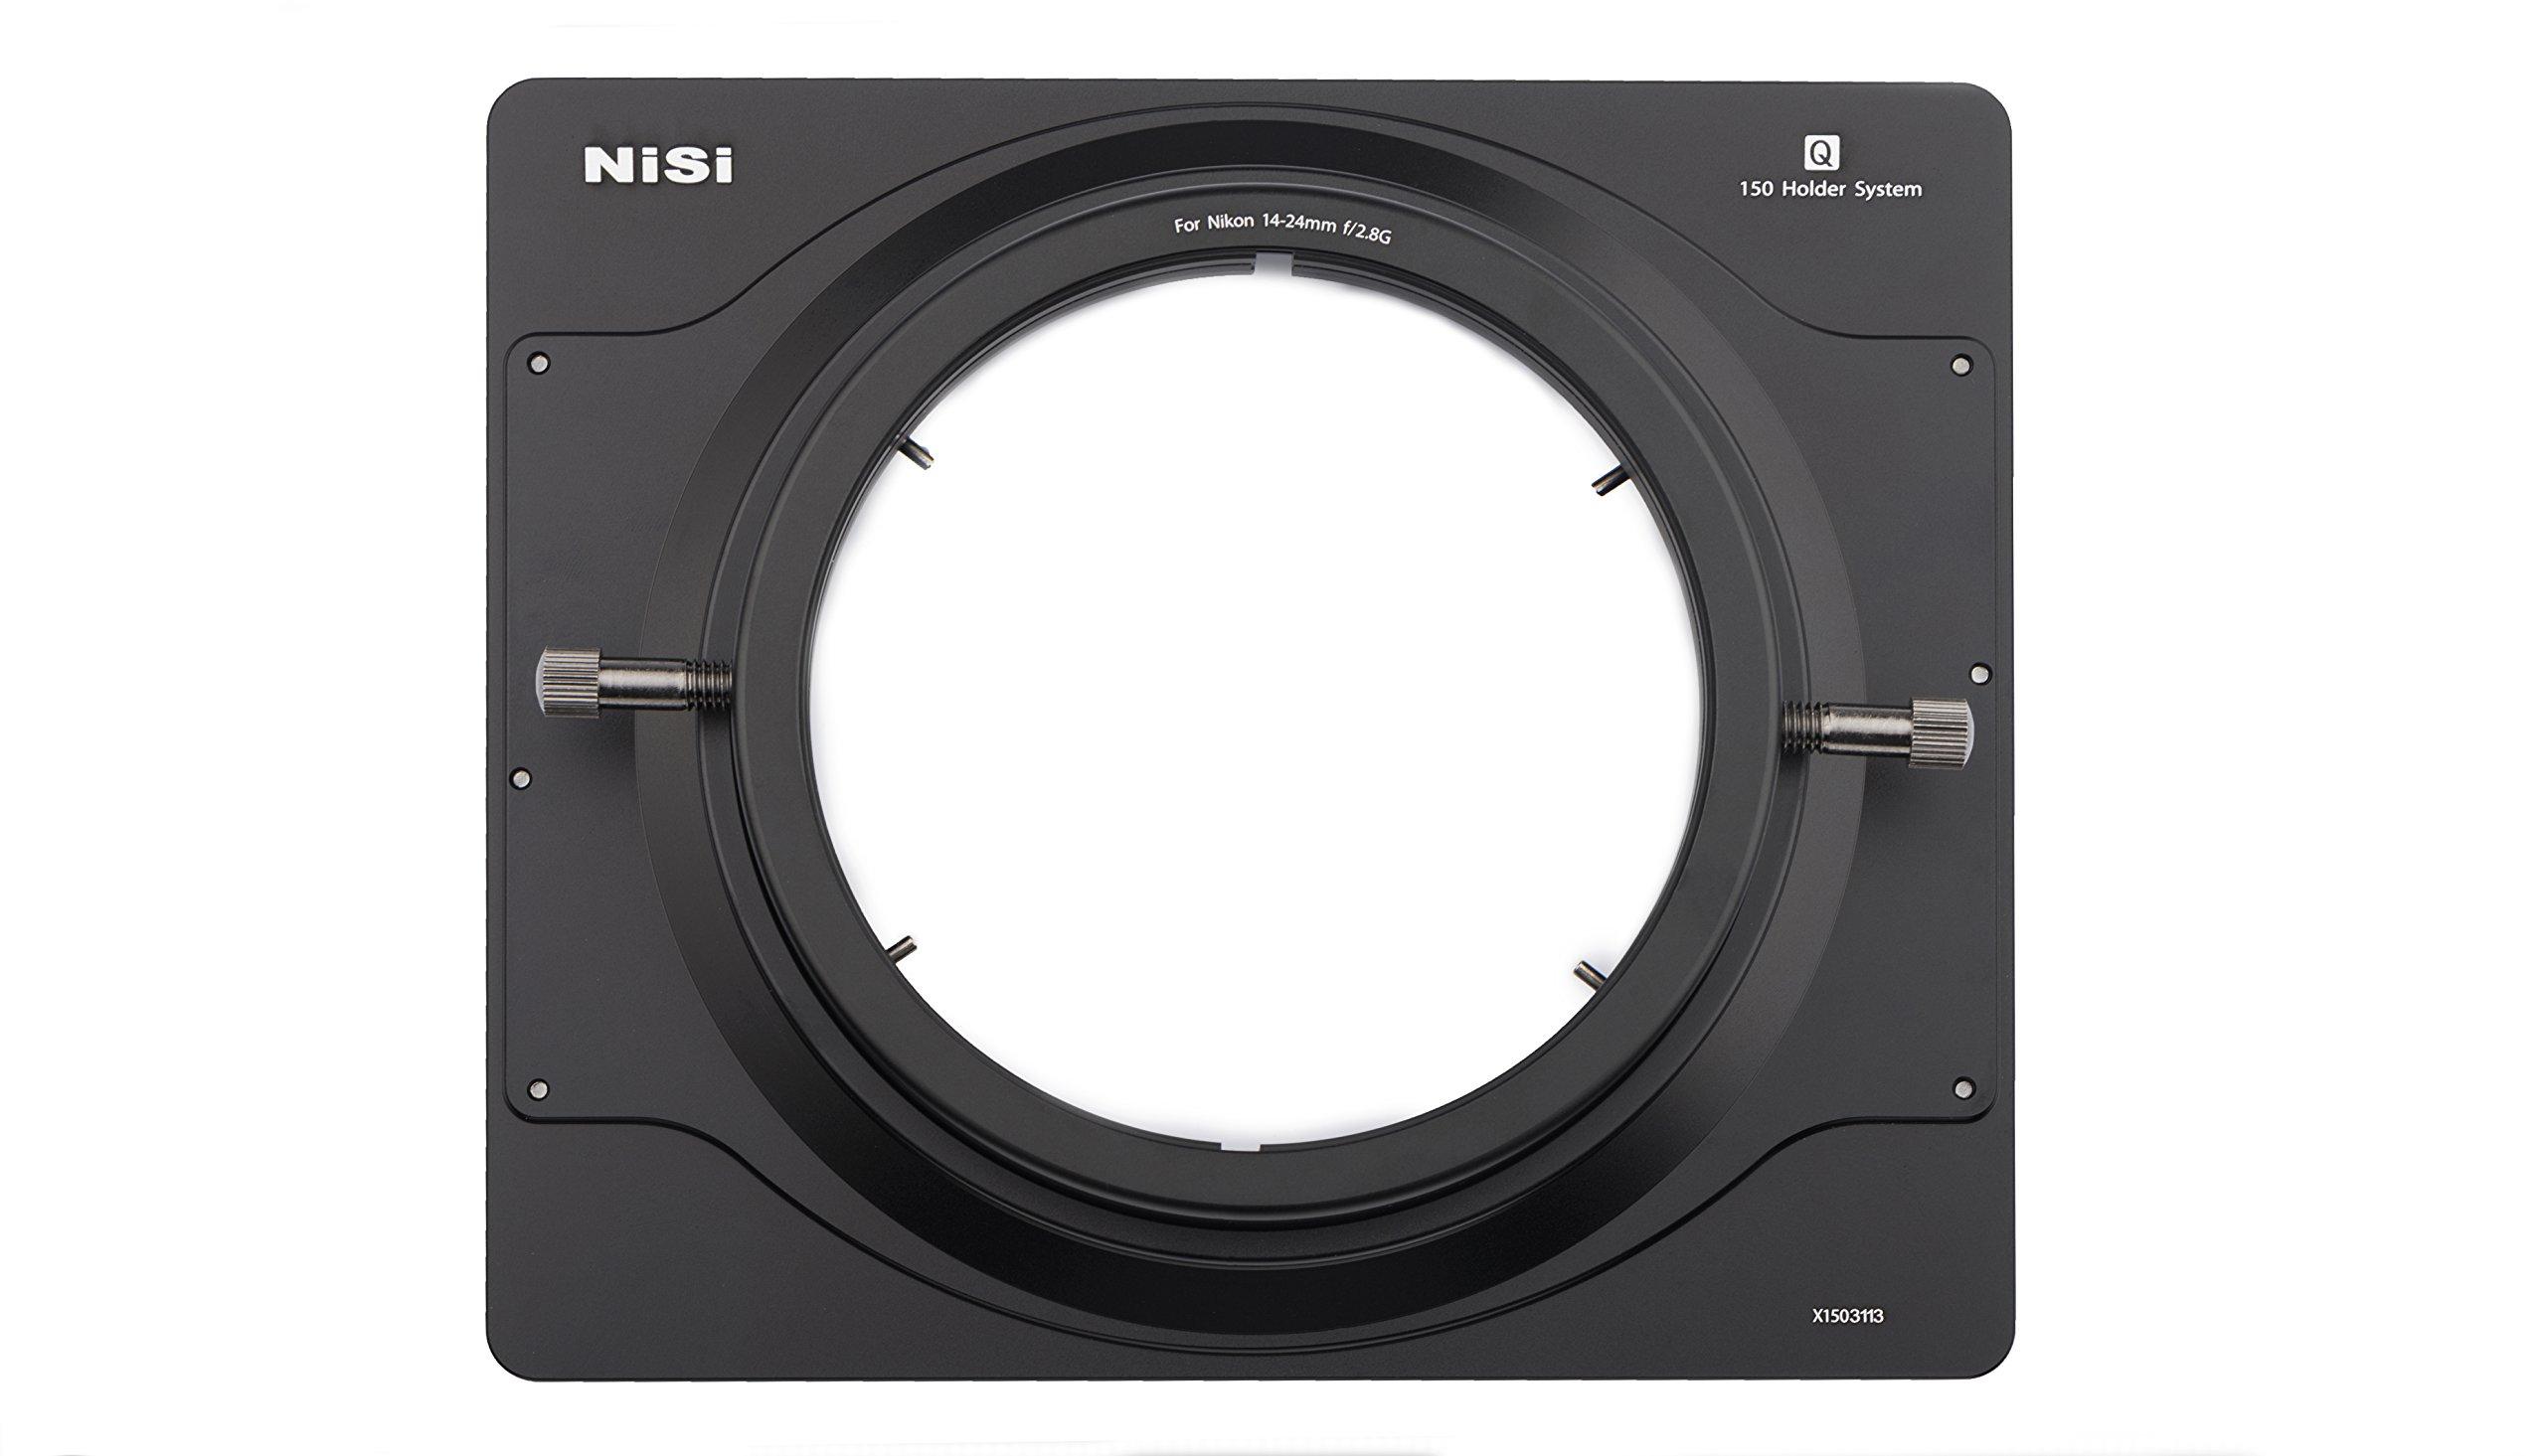 NiSi Q Series 150mm Filter Holder for Nikon 14-24mm Lenses by NiSi